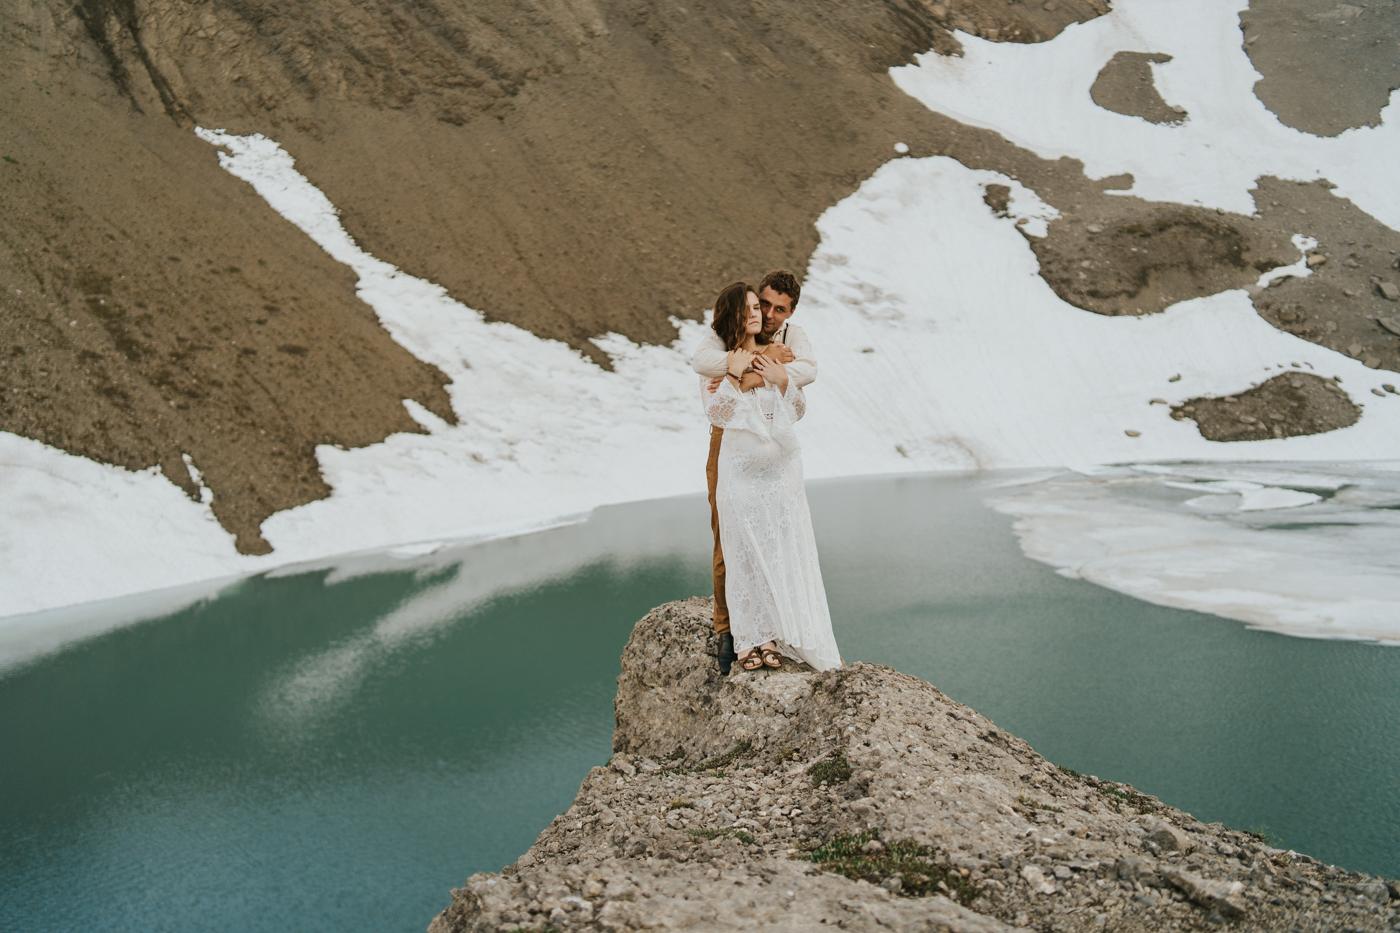 tyraephotography_photographer_wedding_elopement_engagement_photography-07803.jpg